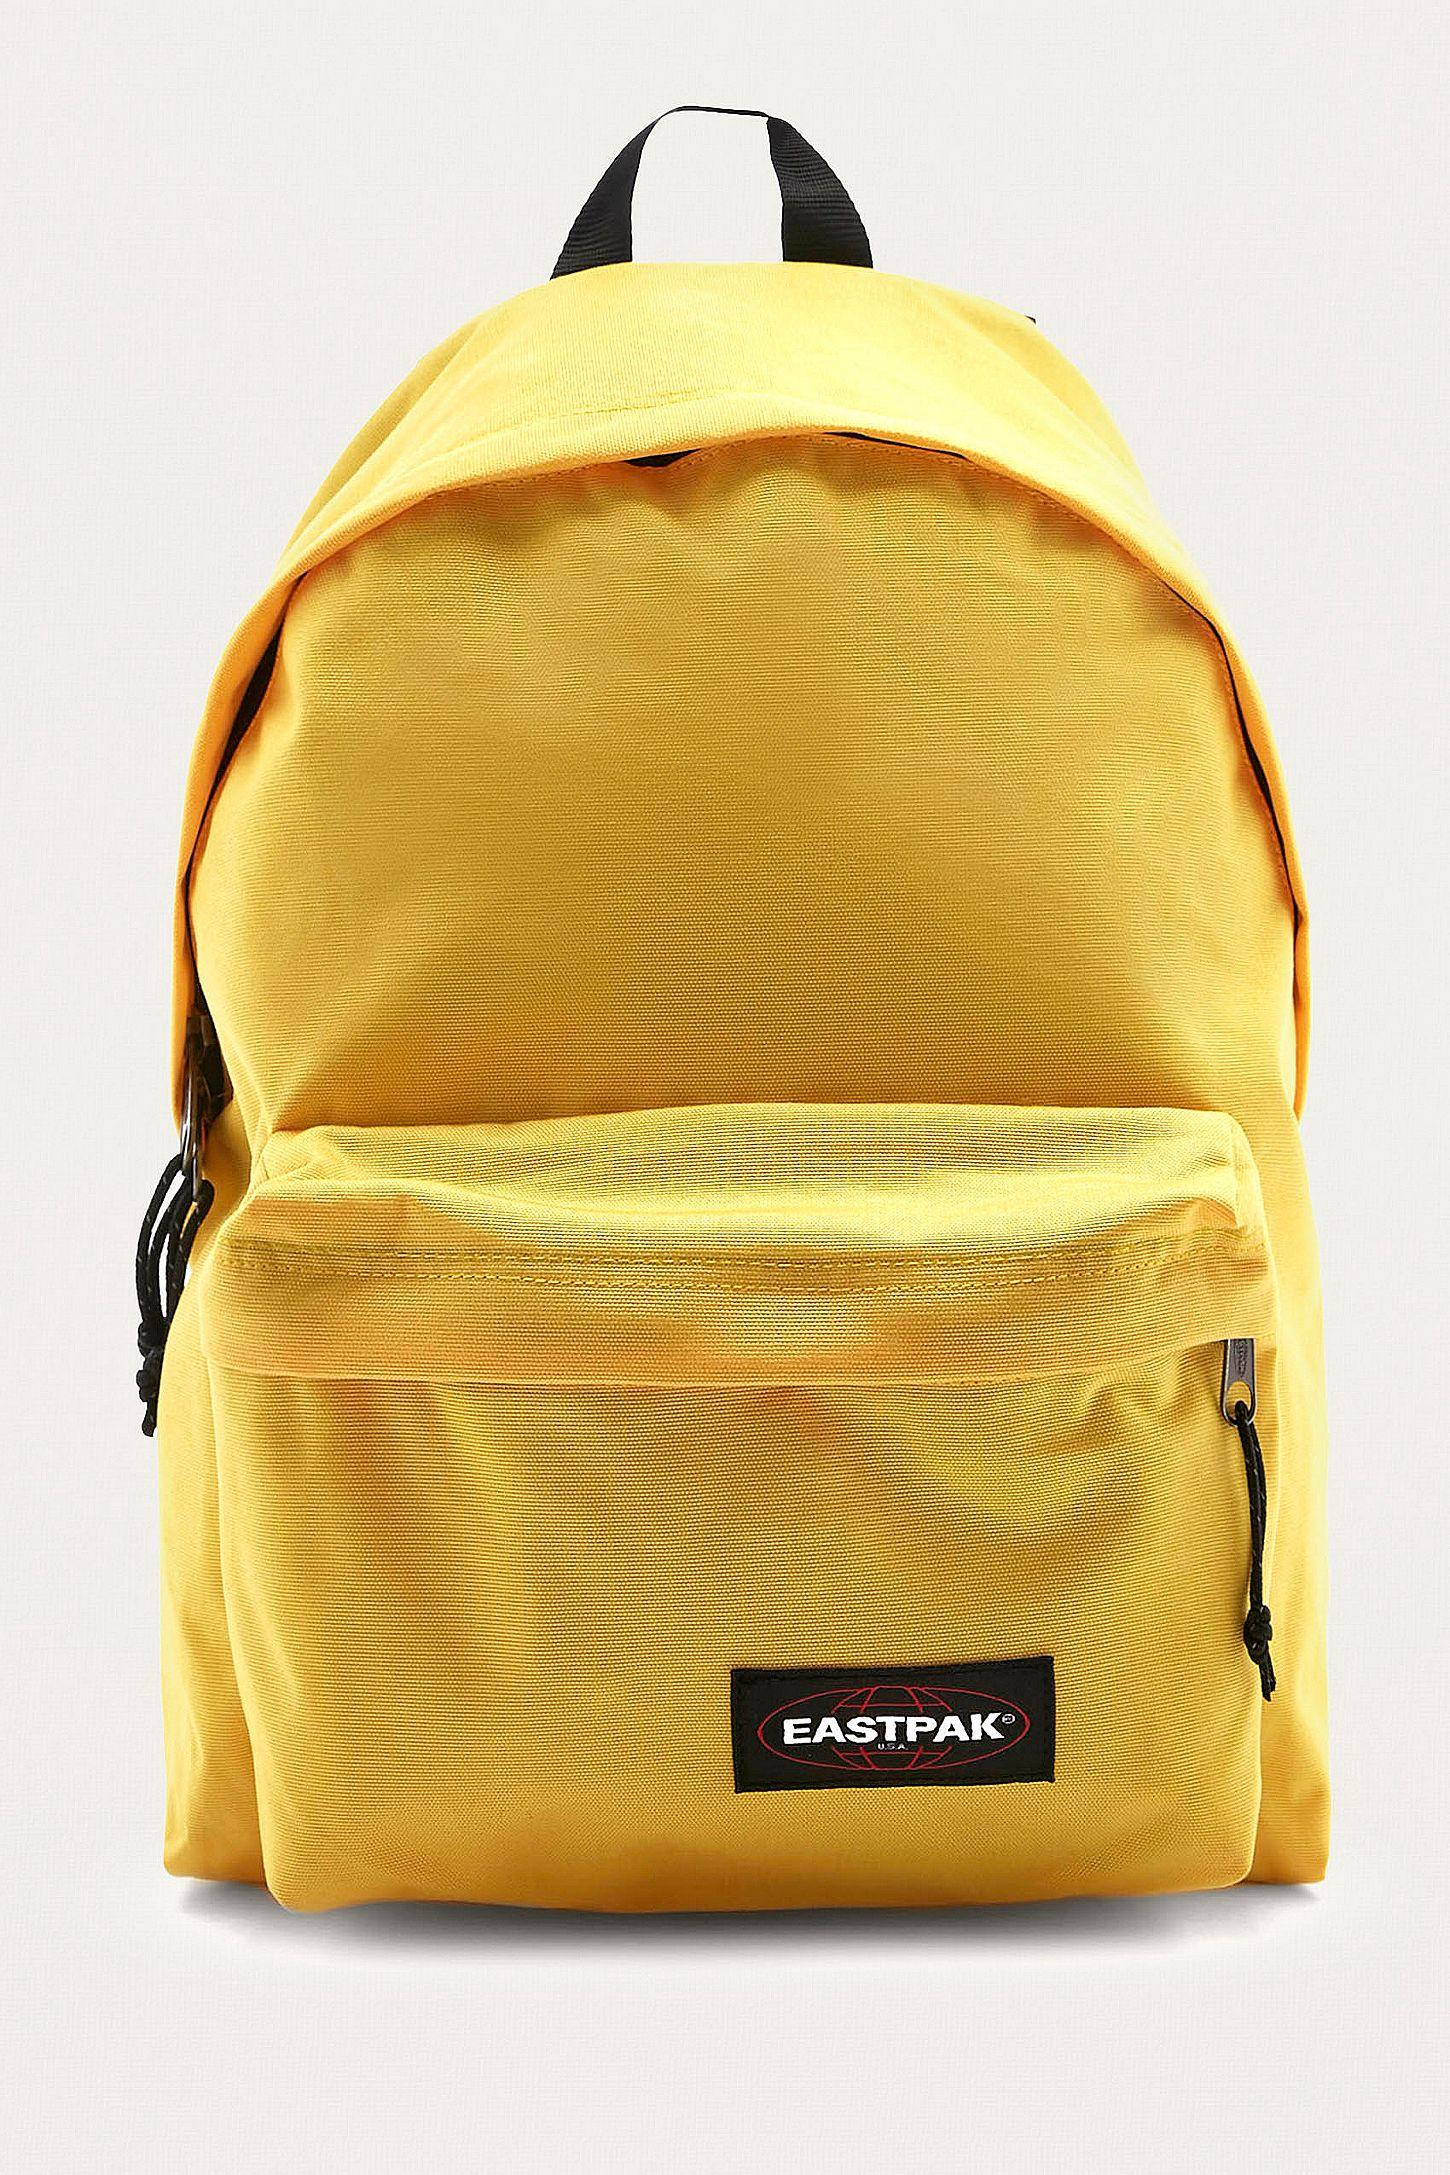 Eastpak Padded Pak R Flexible Yellow Backpack